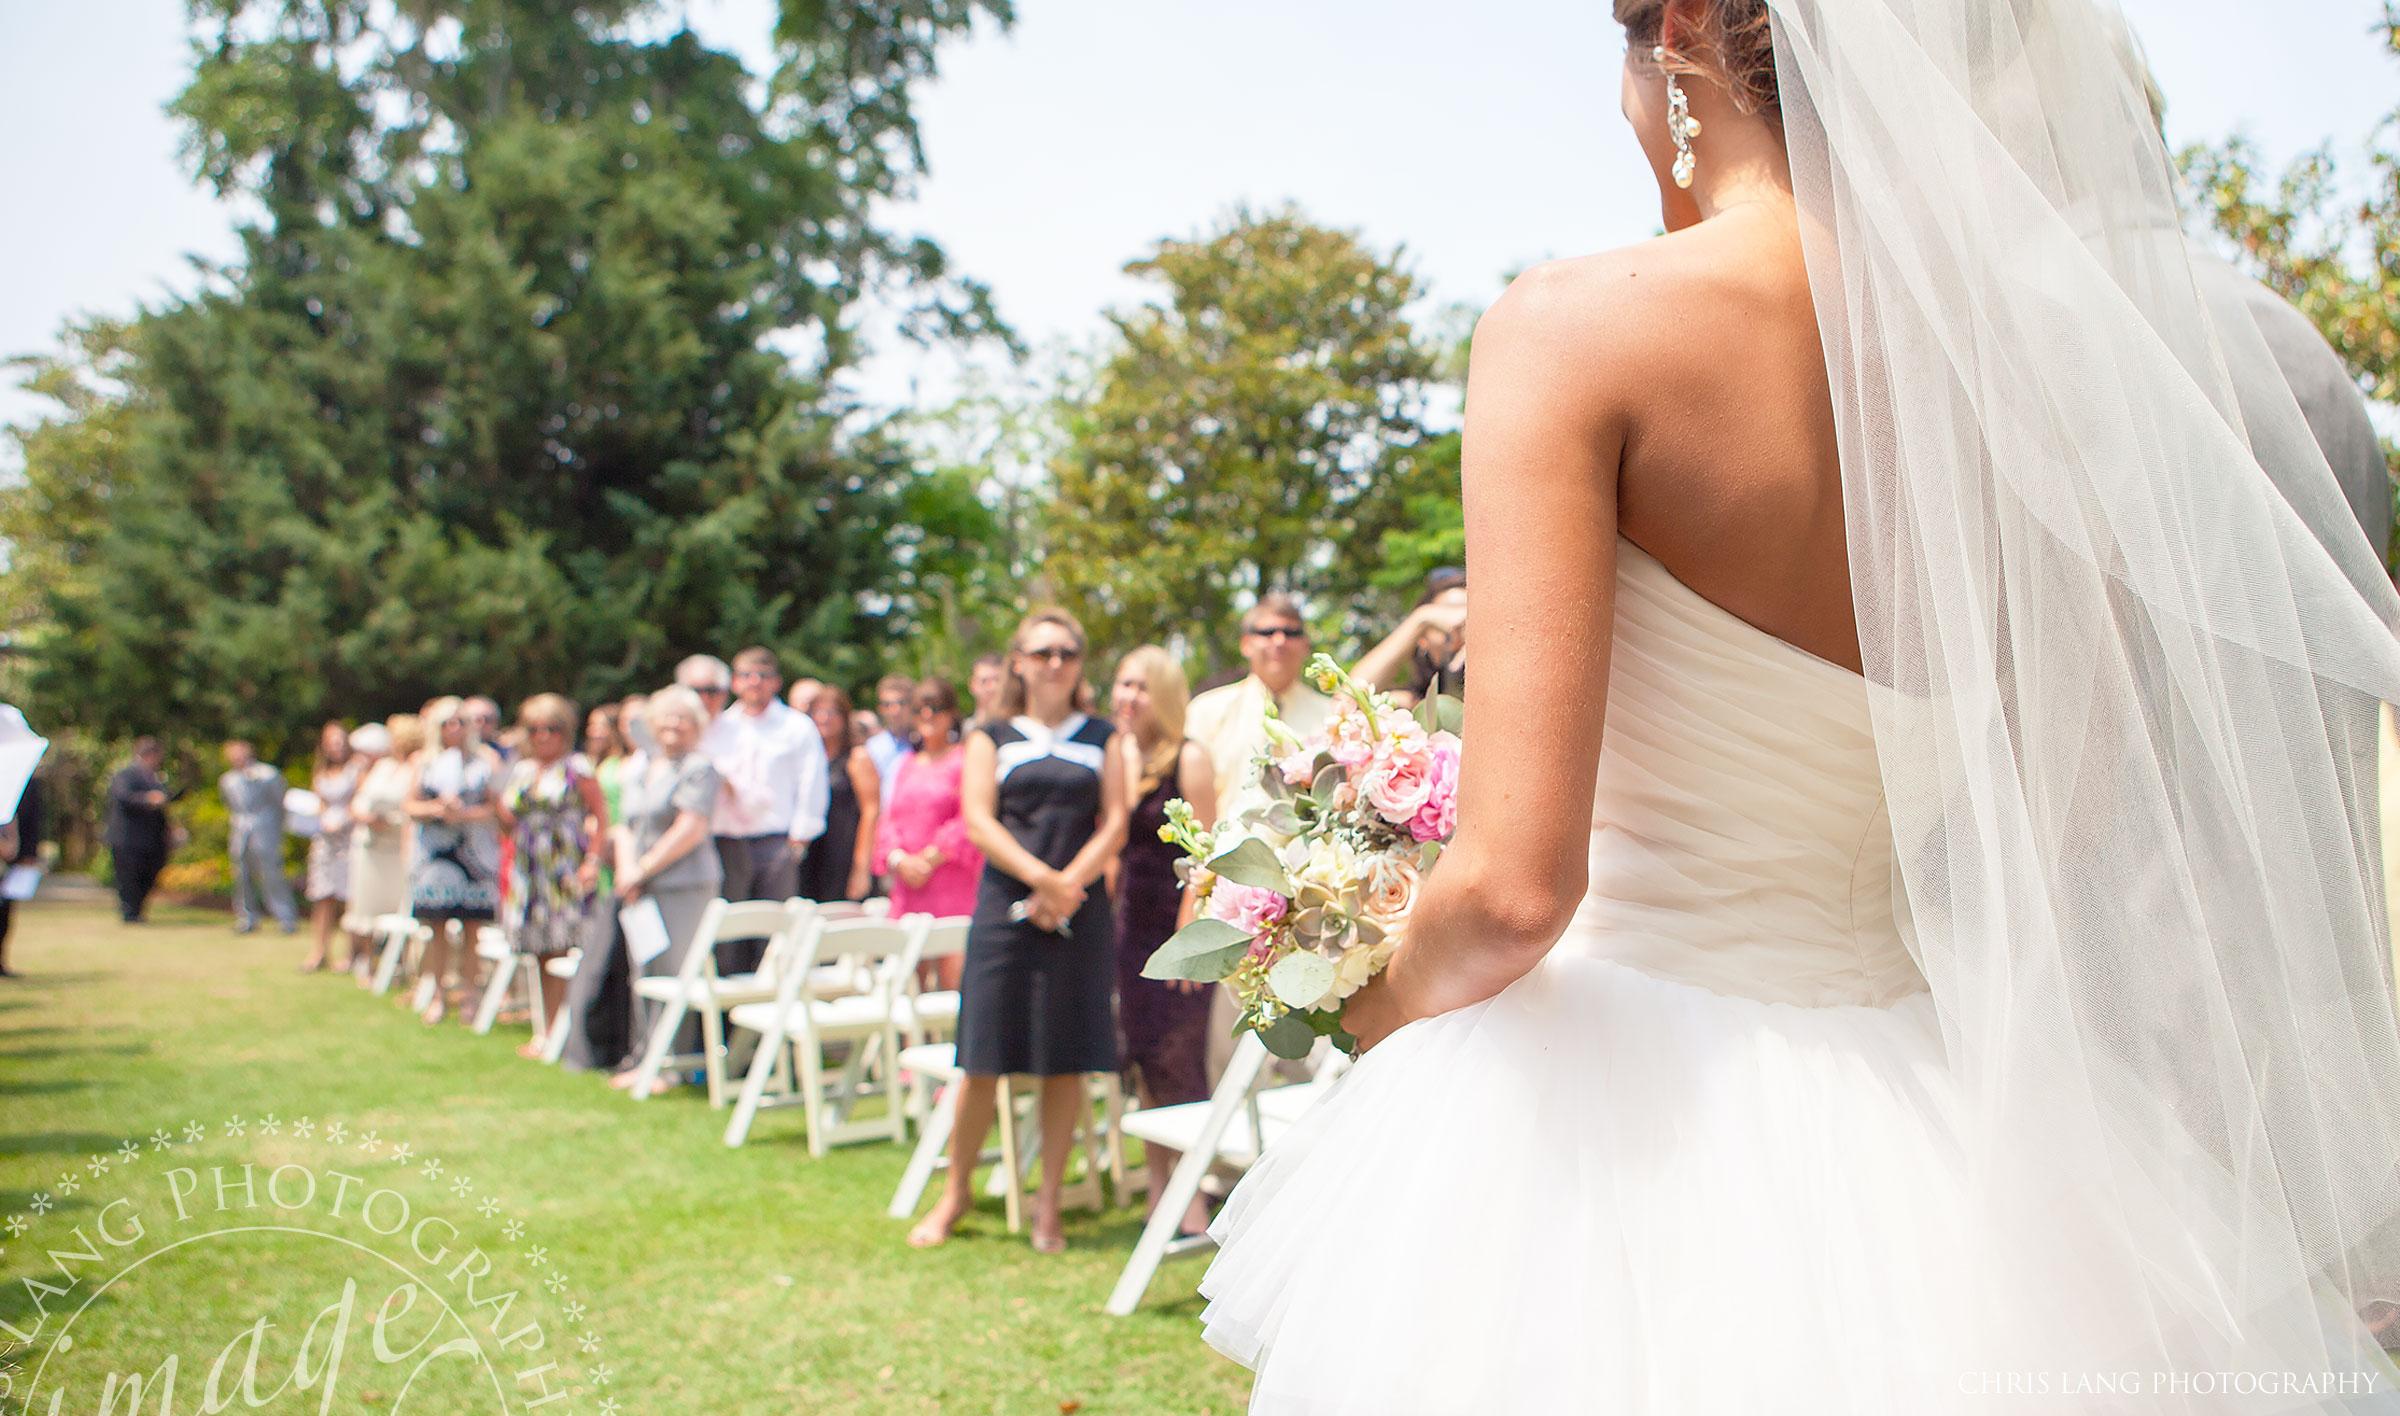 Airlie Gardens Outdoor Garden weddings Airlie Gardens Weddings